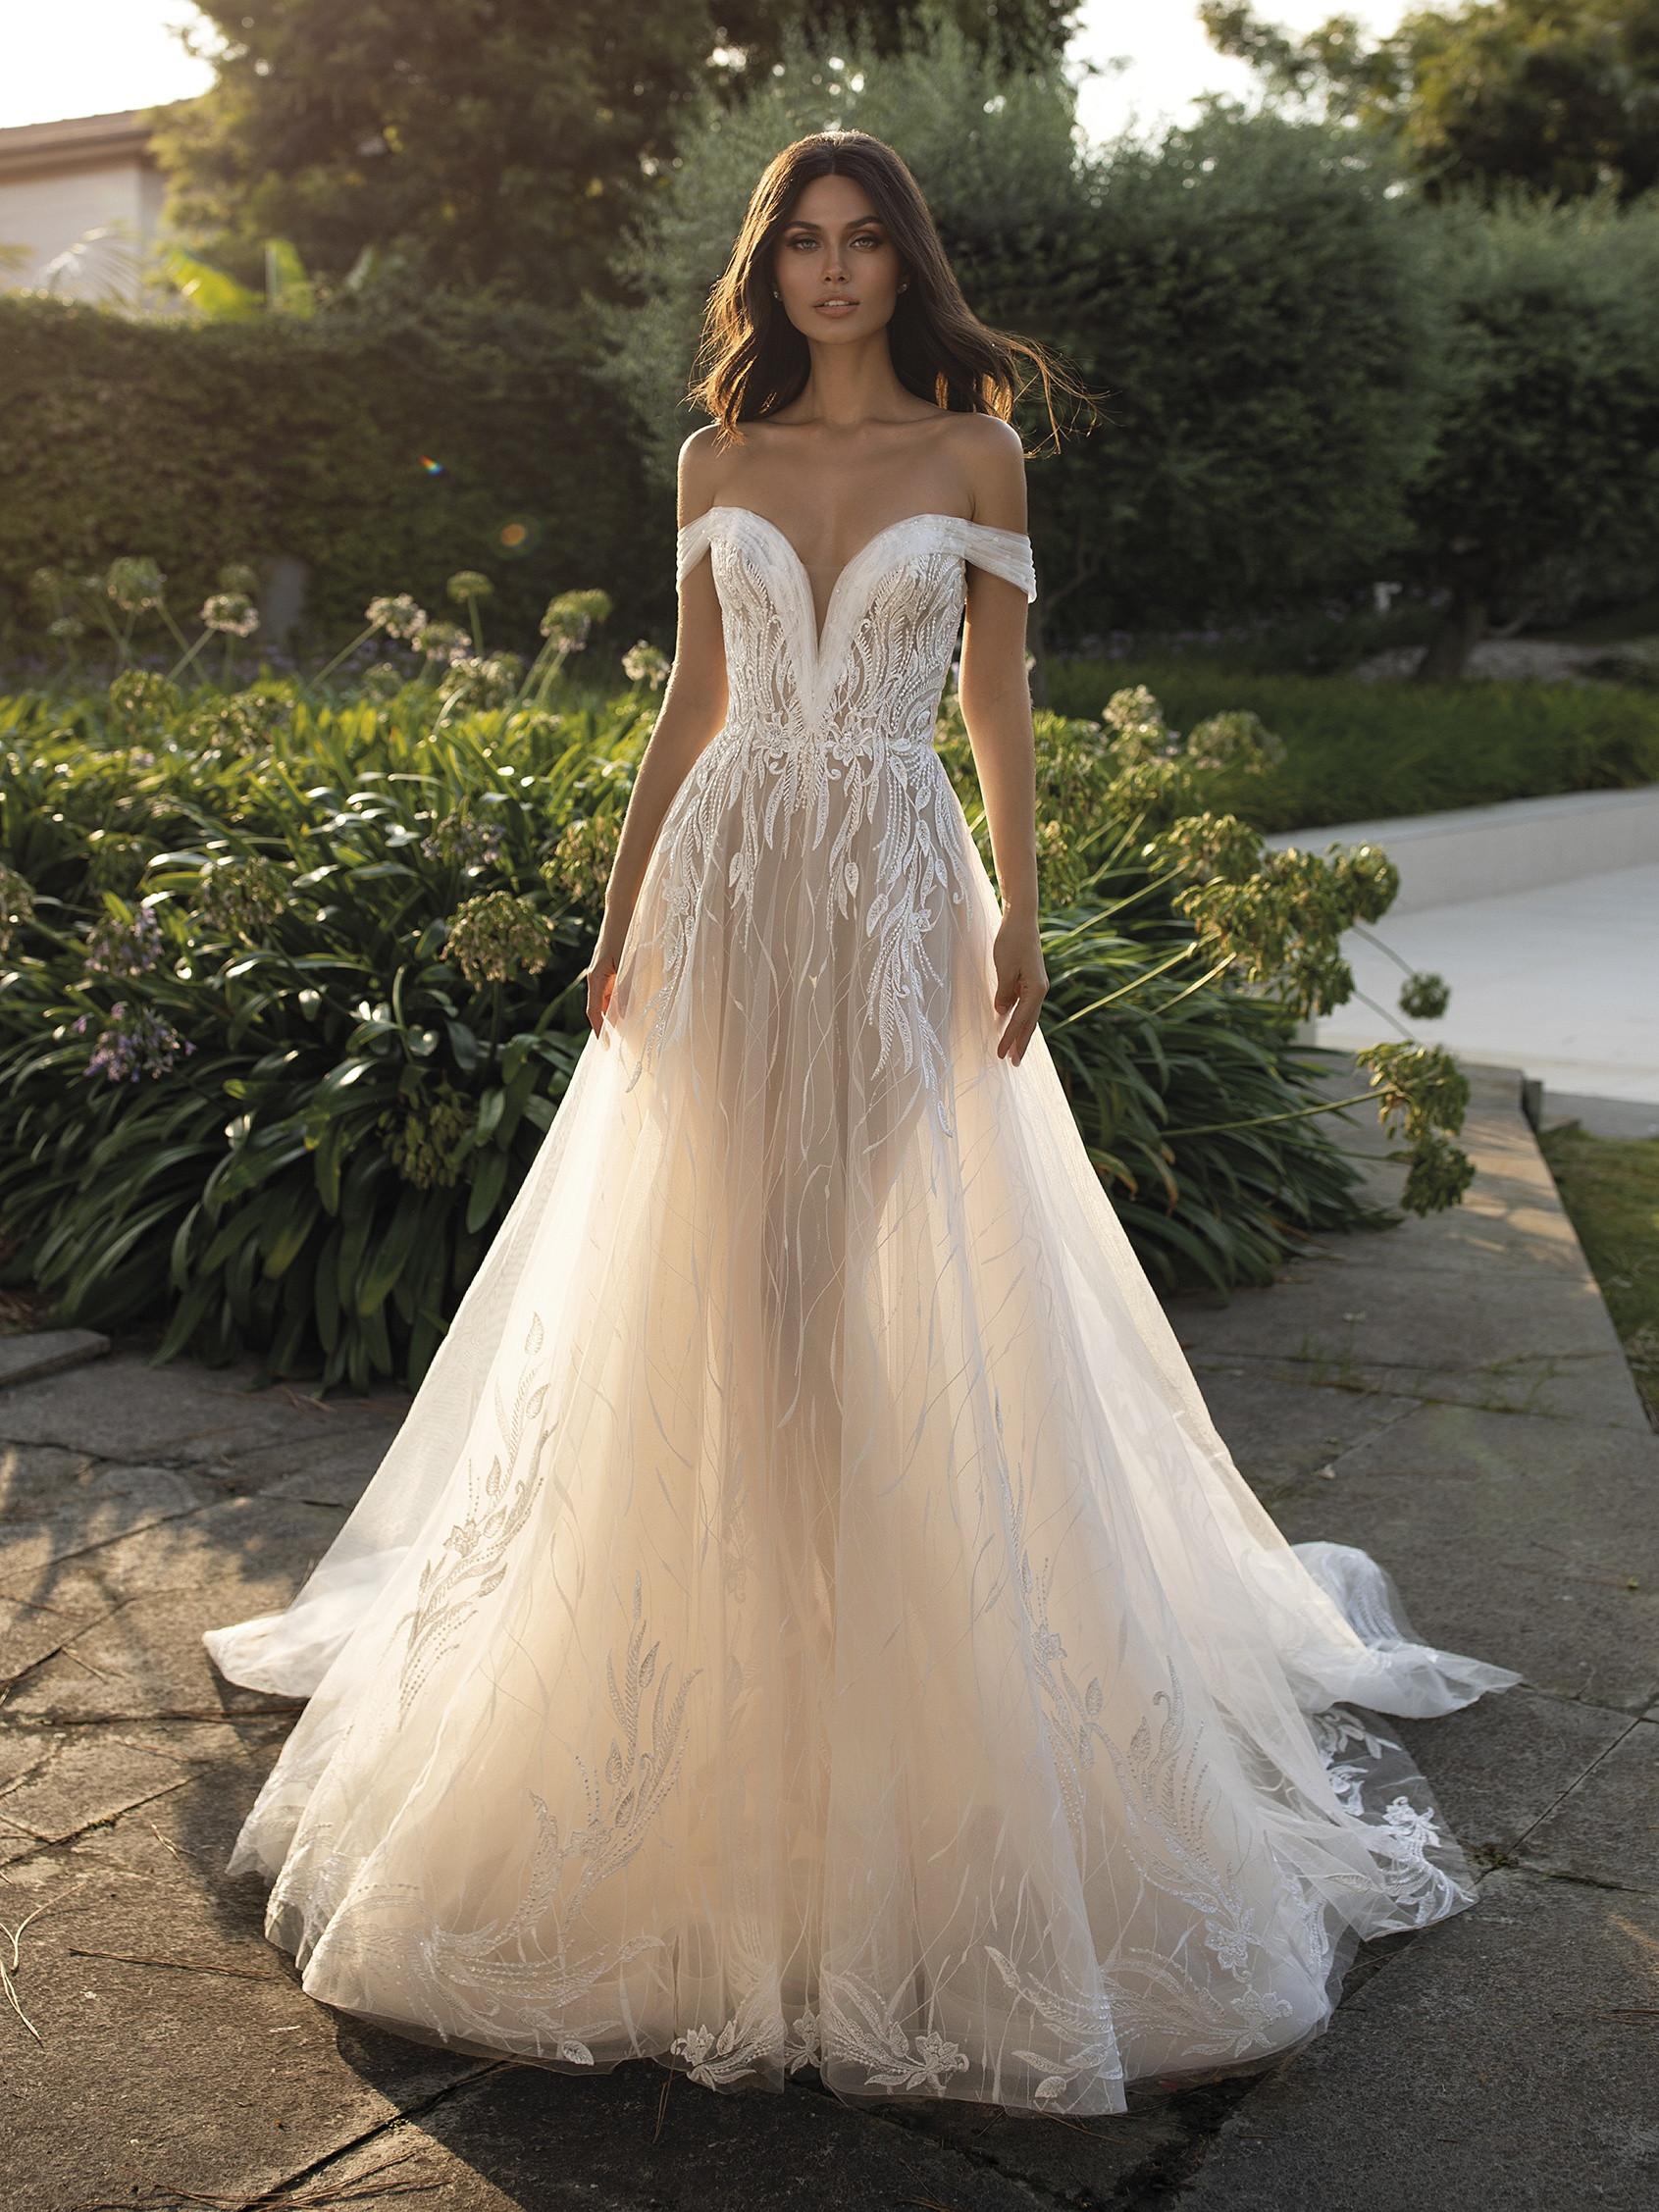 Cloe menyasszonyi ruha - Pronovias 2021